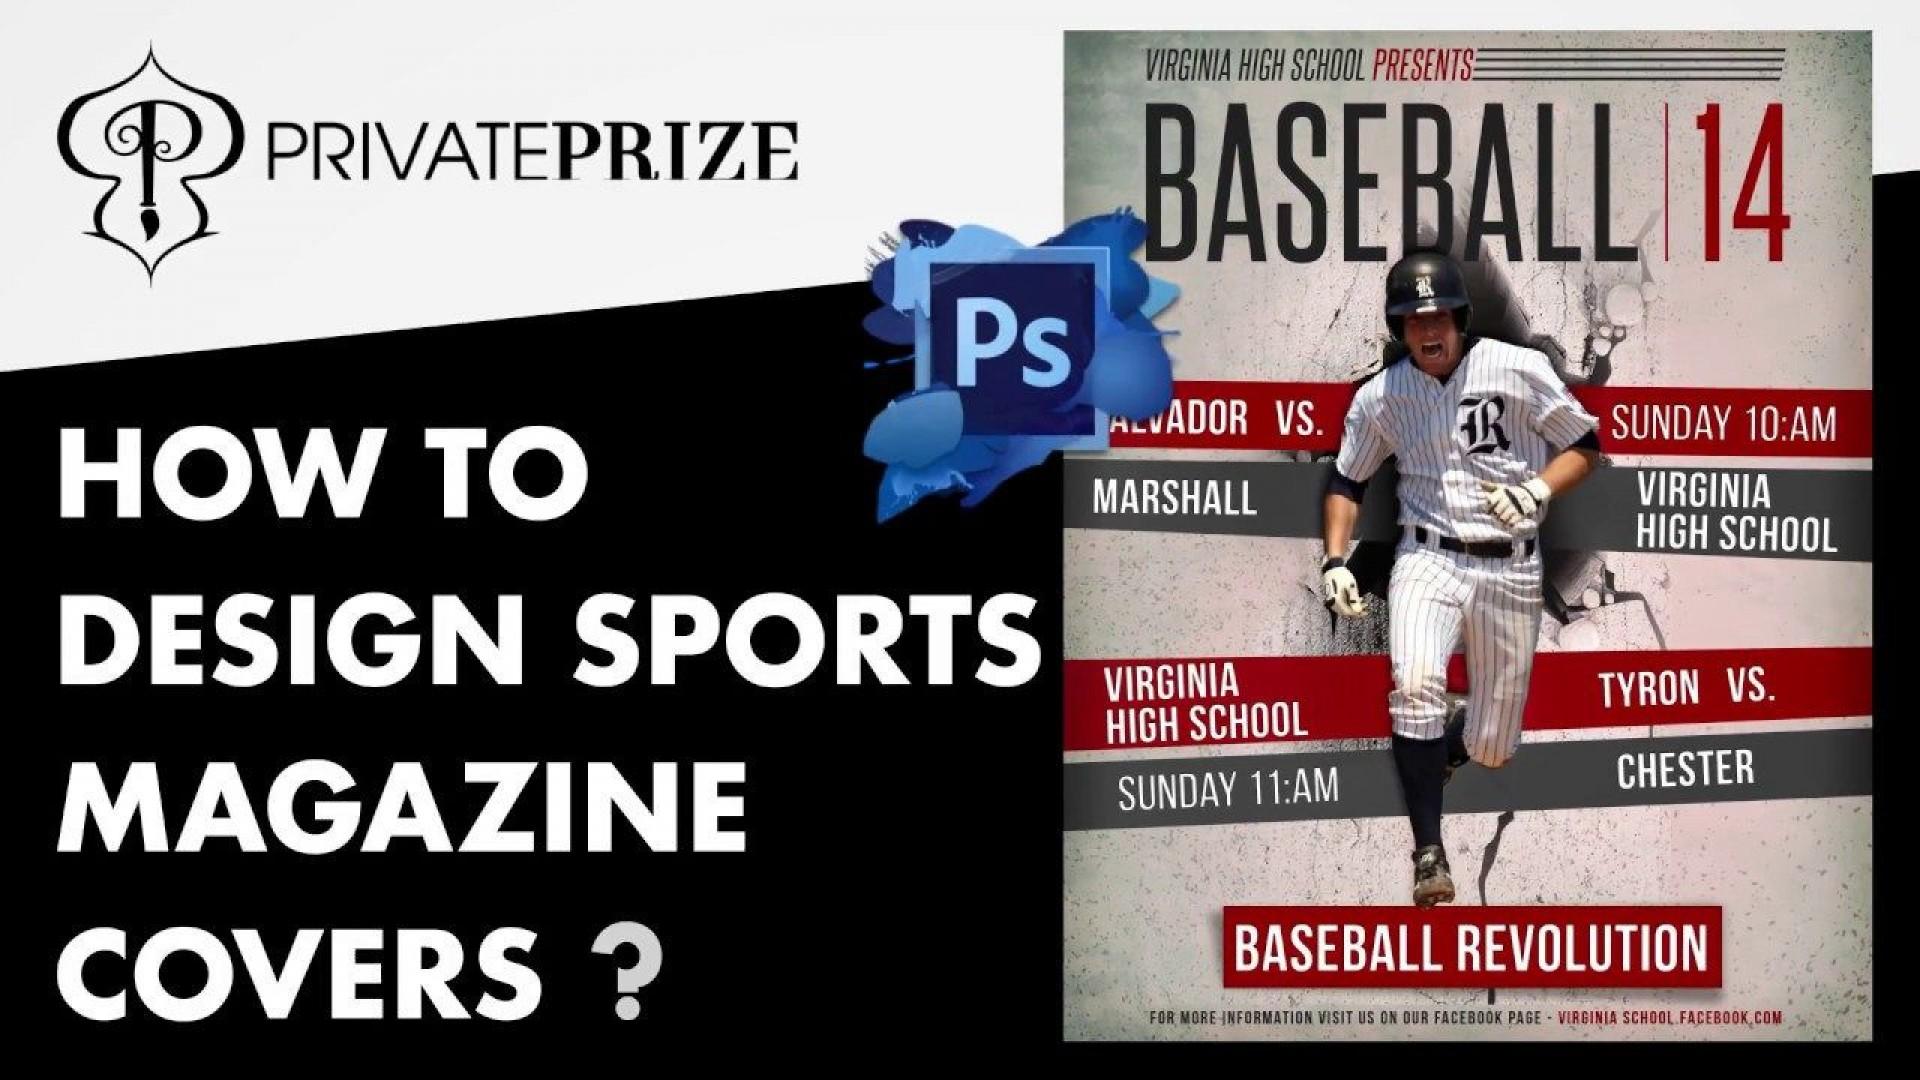 004 Impressive Photoshop Baseball Magazine Cover Template Concept 1920